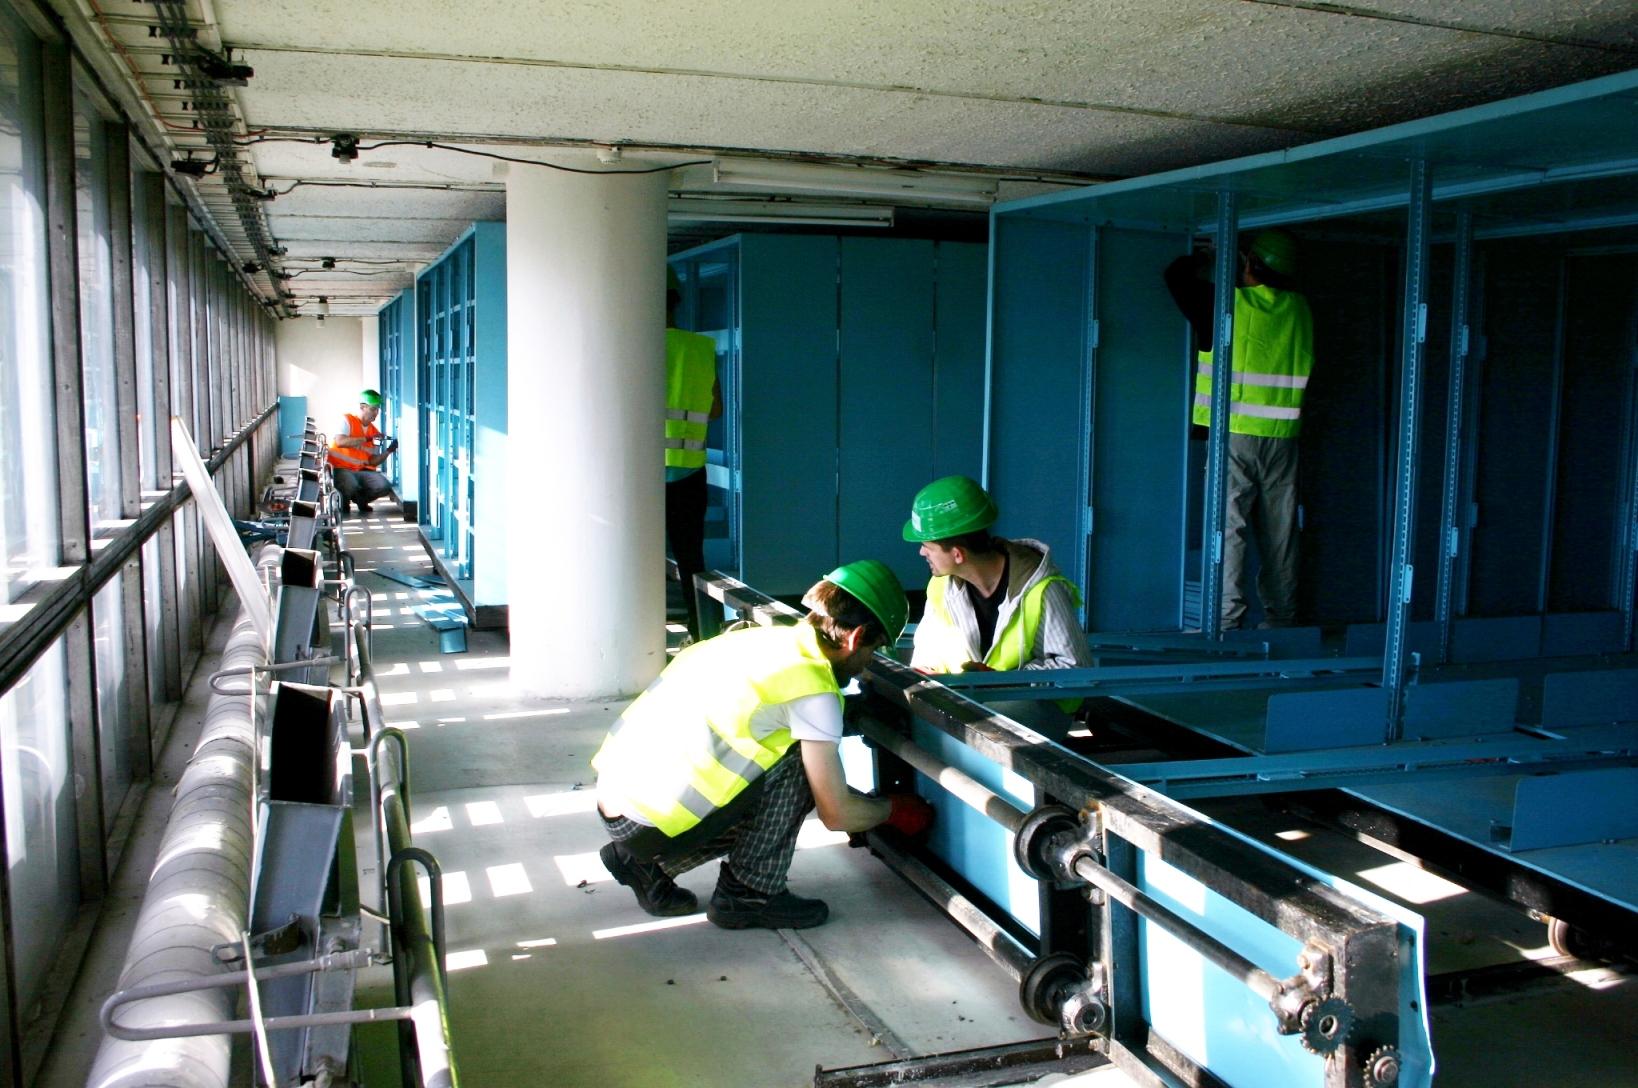 2014-11-05 Rekonstrukcia depozitov SNK 3